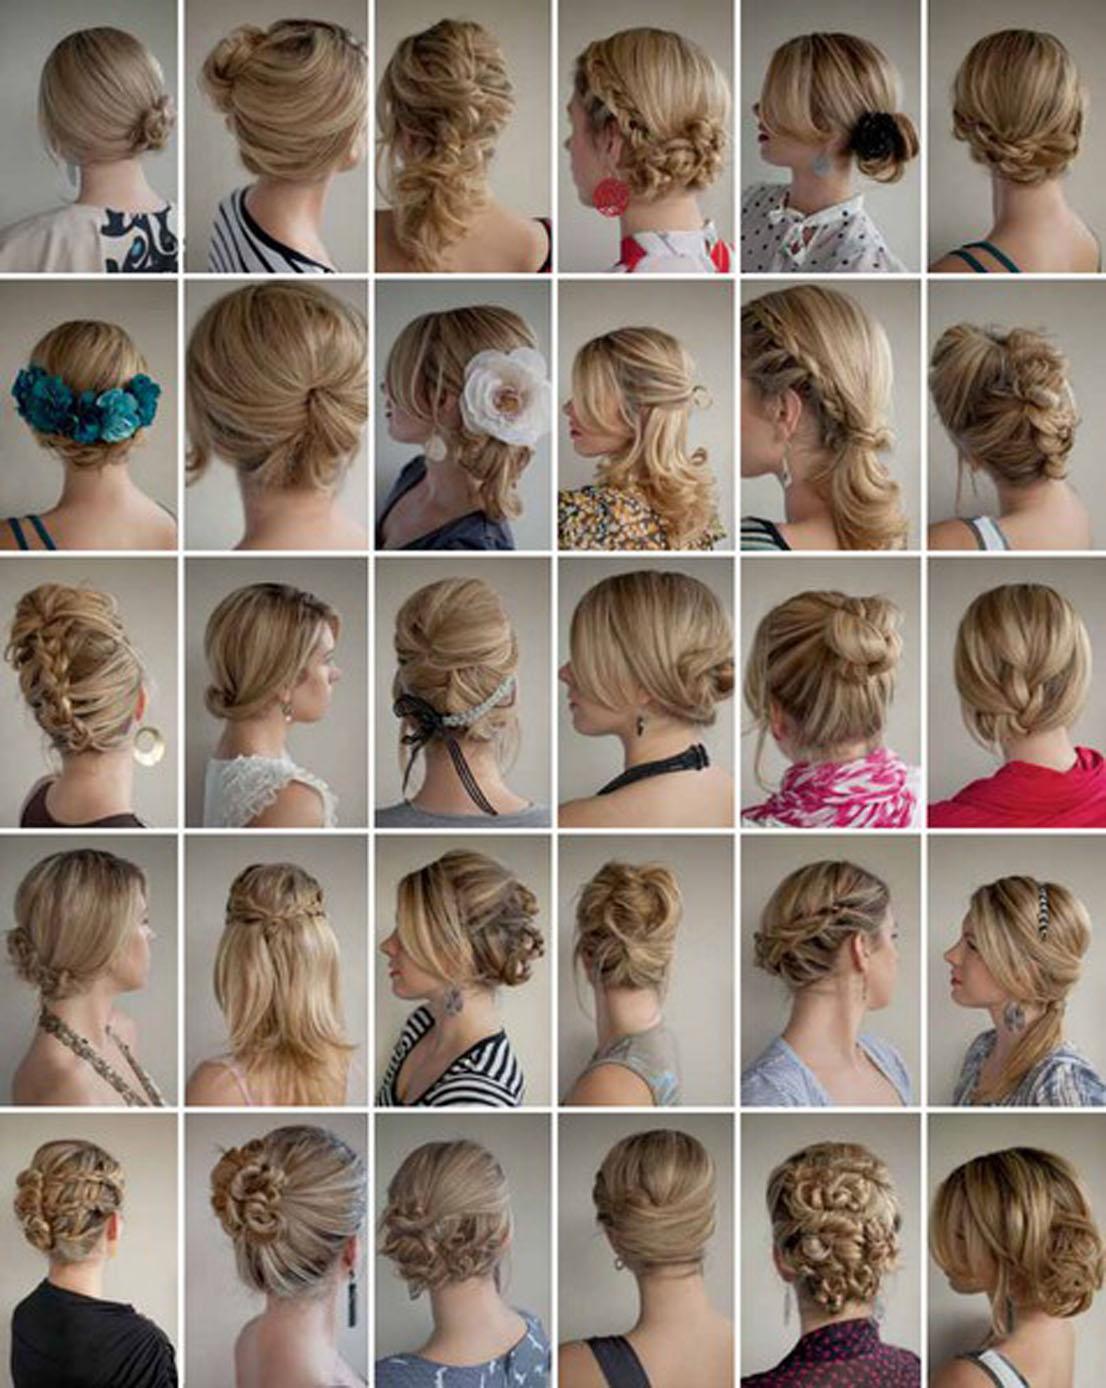 Wondrous Easy Ways To Braid Your Hair The Chic Wave Short Hairstyles Gunalazisus